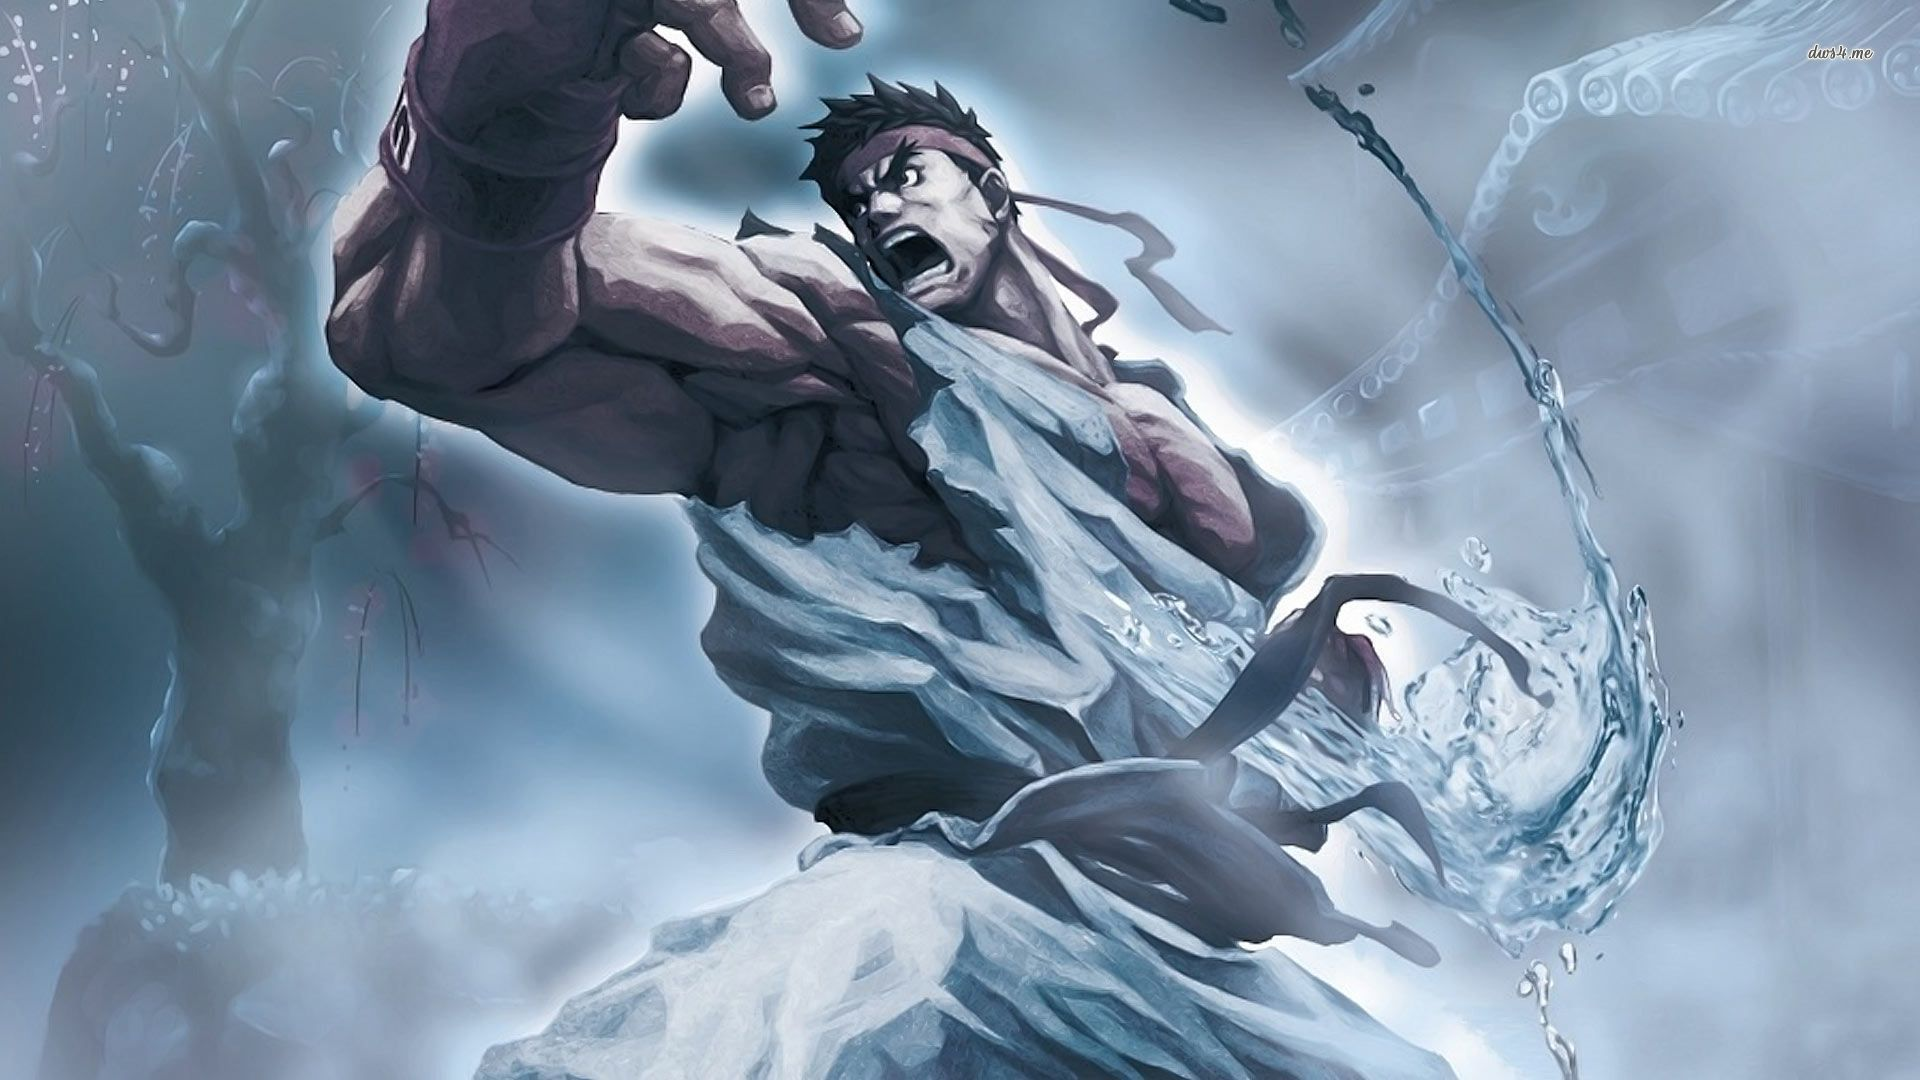 street fighter ryu wallpaper - sf wallpaper